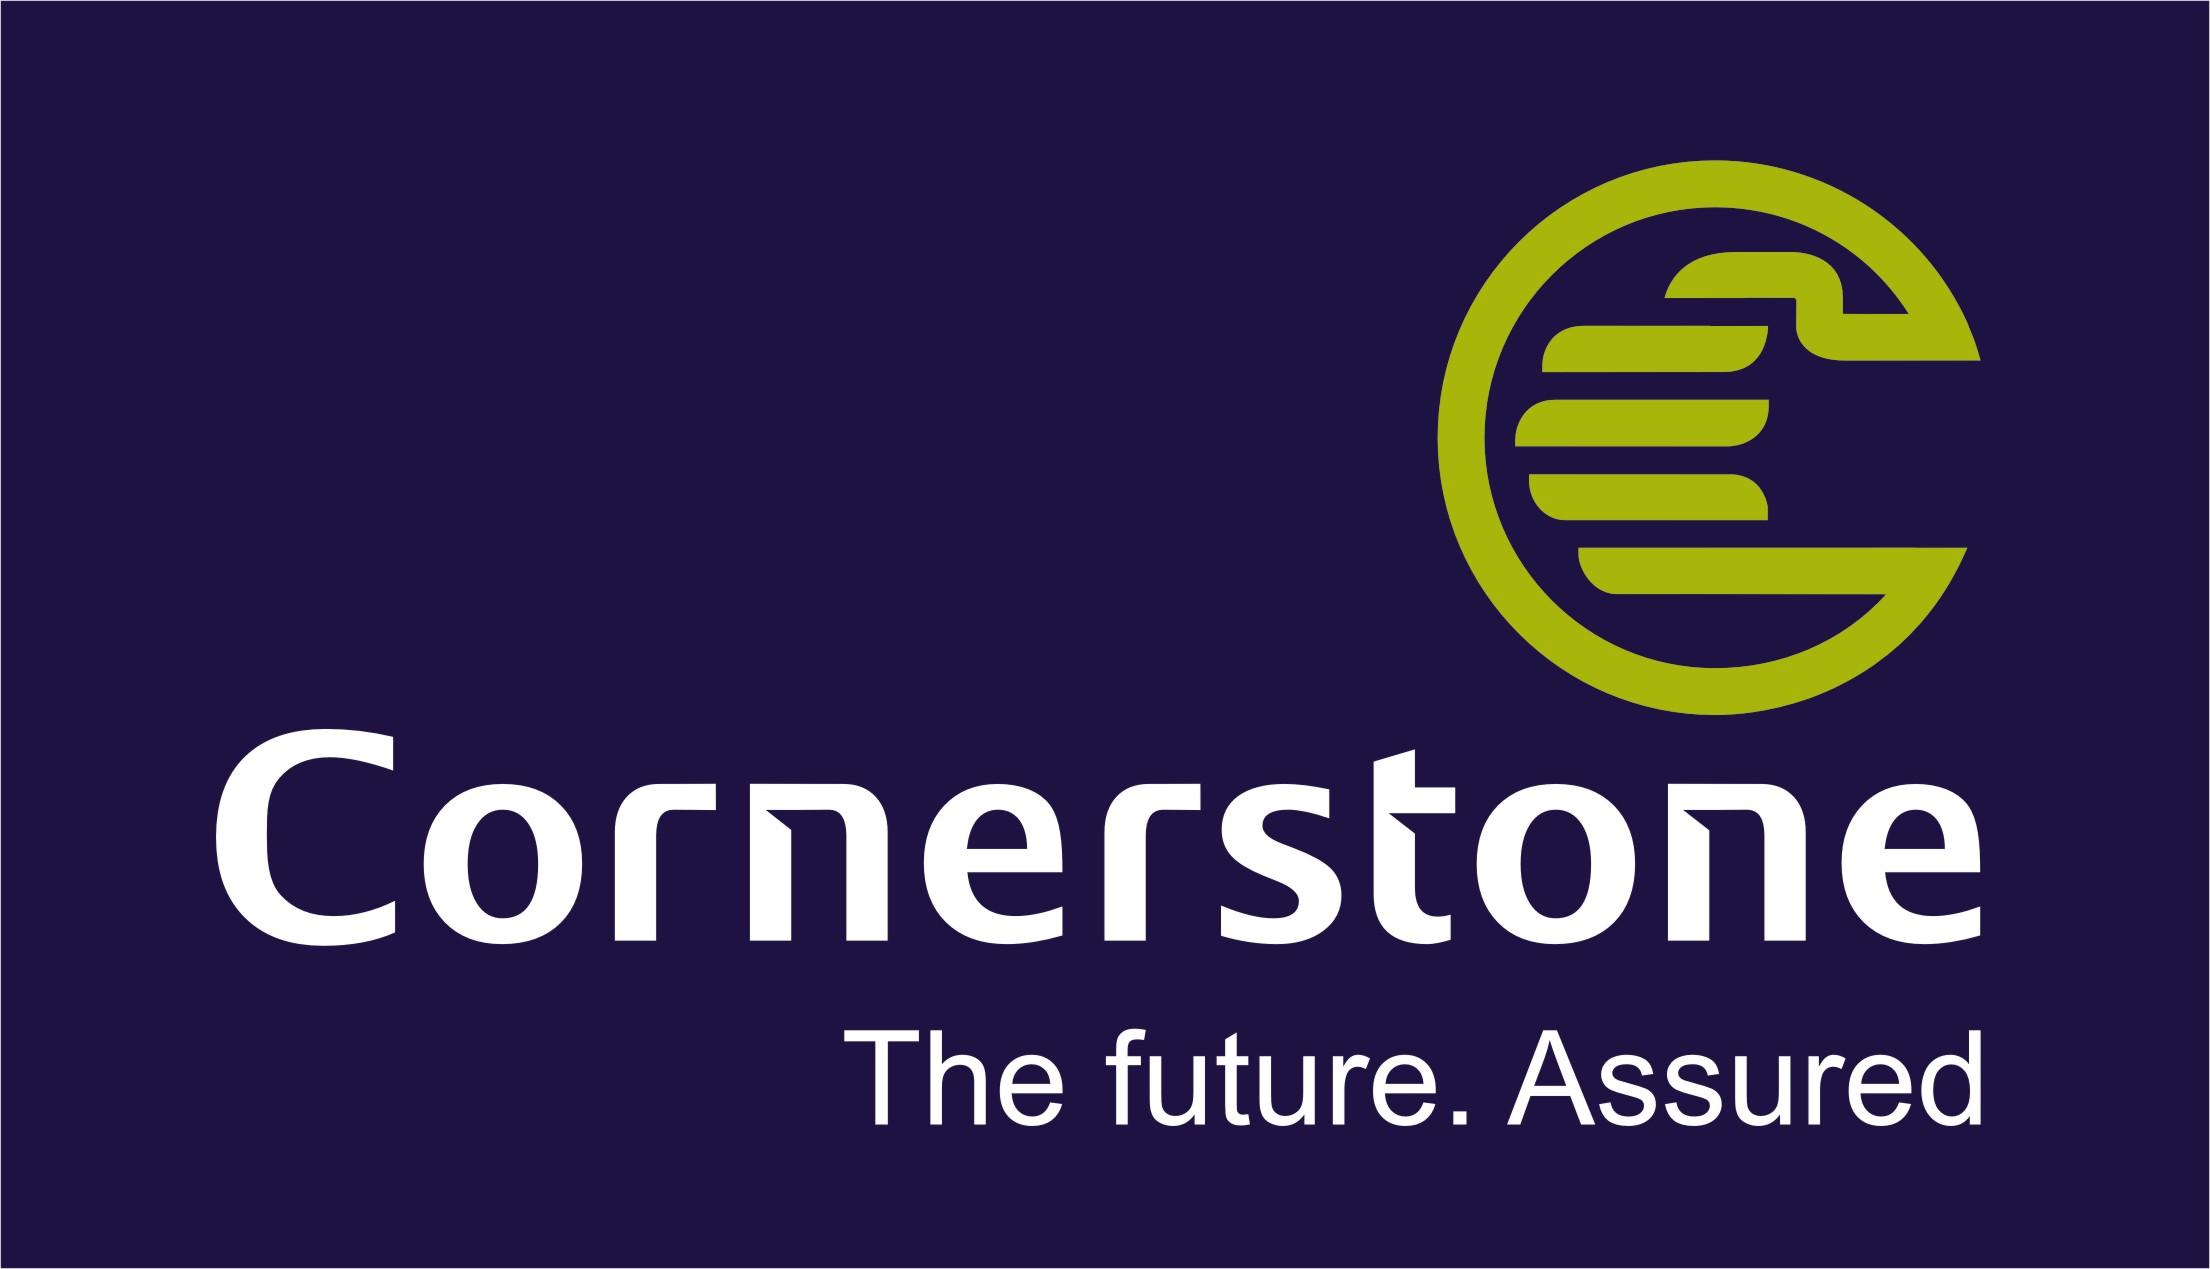 Cornerstone Insurance Plc